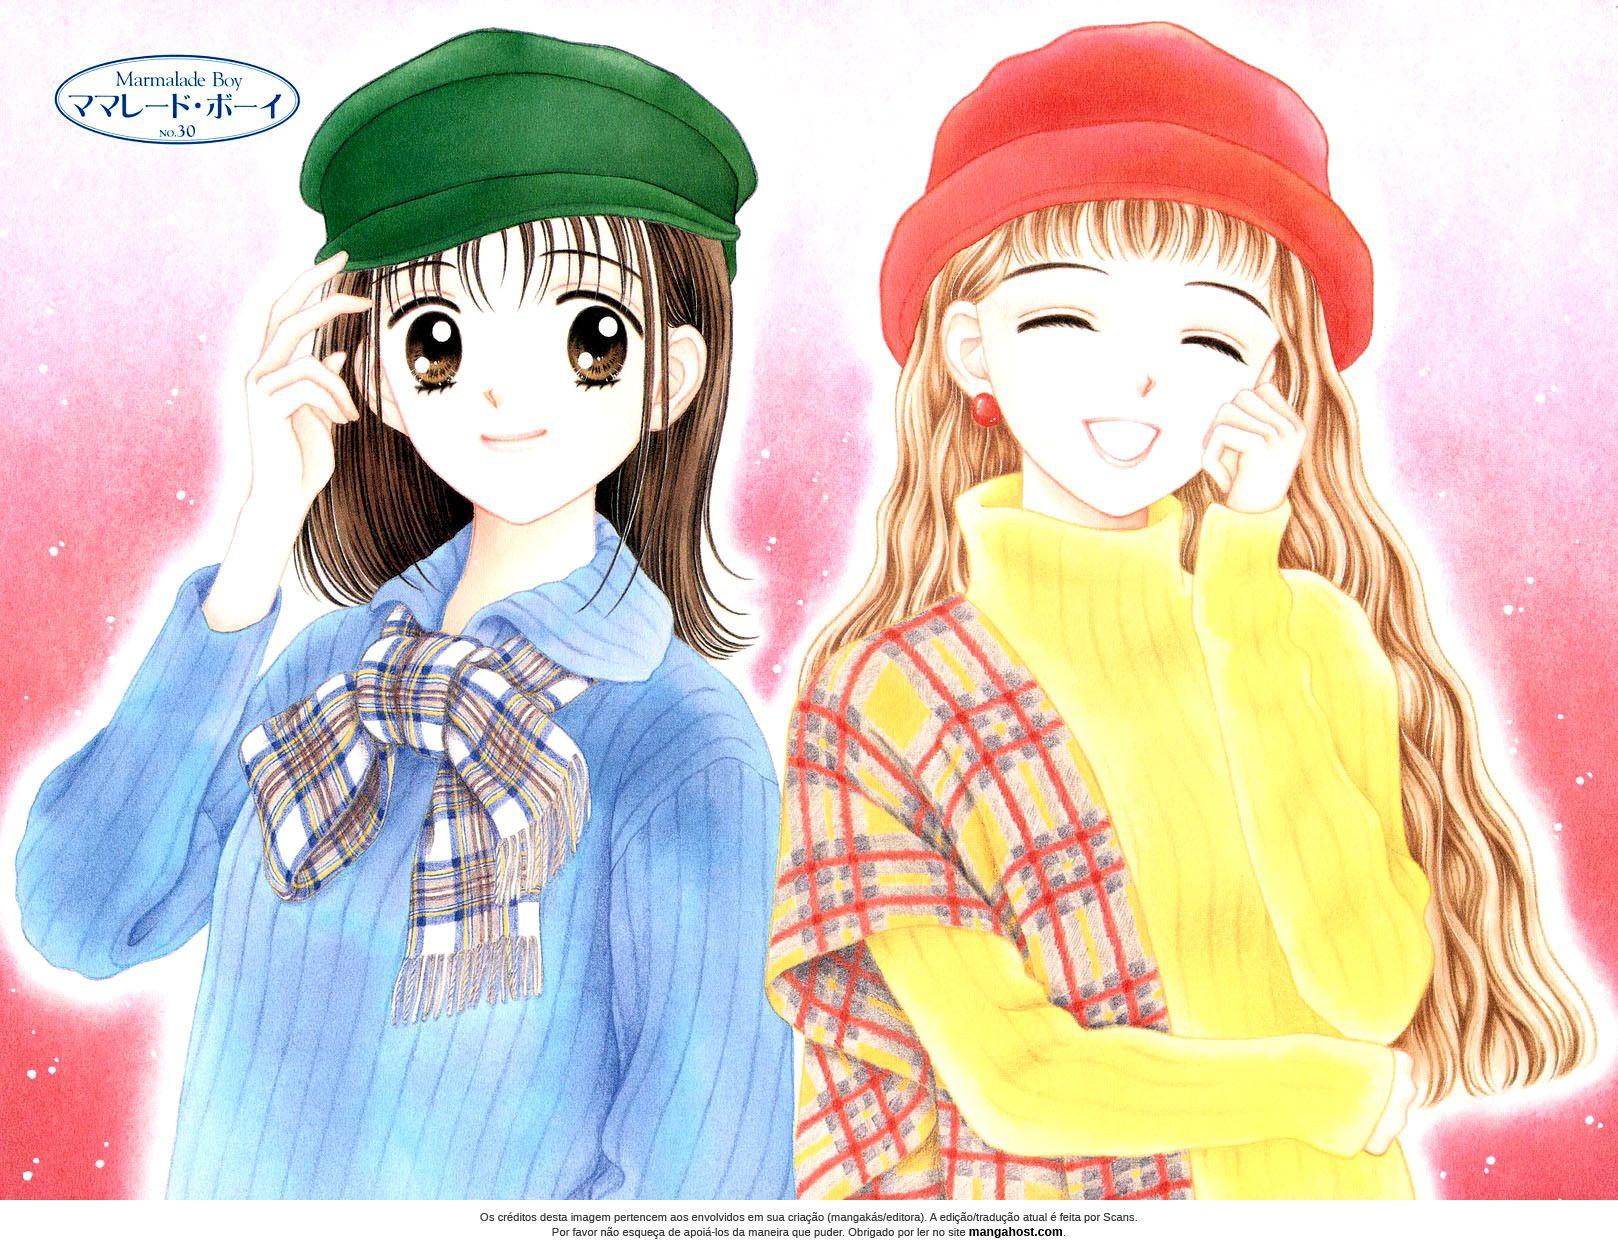 Marmalade Boy manga 秋月, ママレードボーイ, 漫画